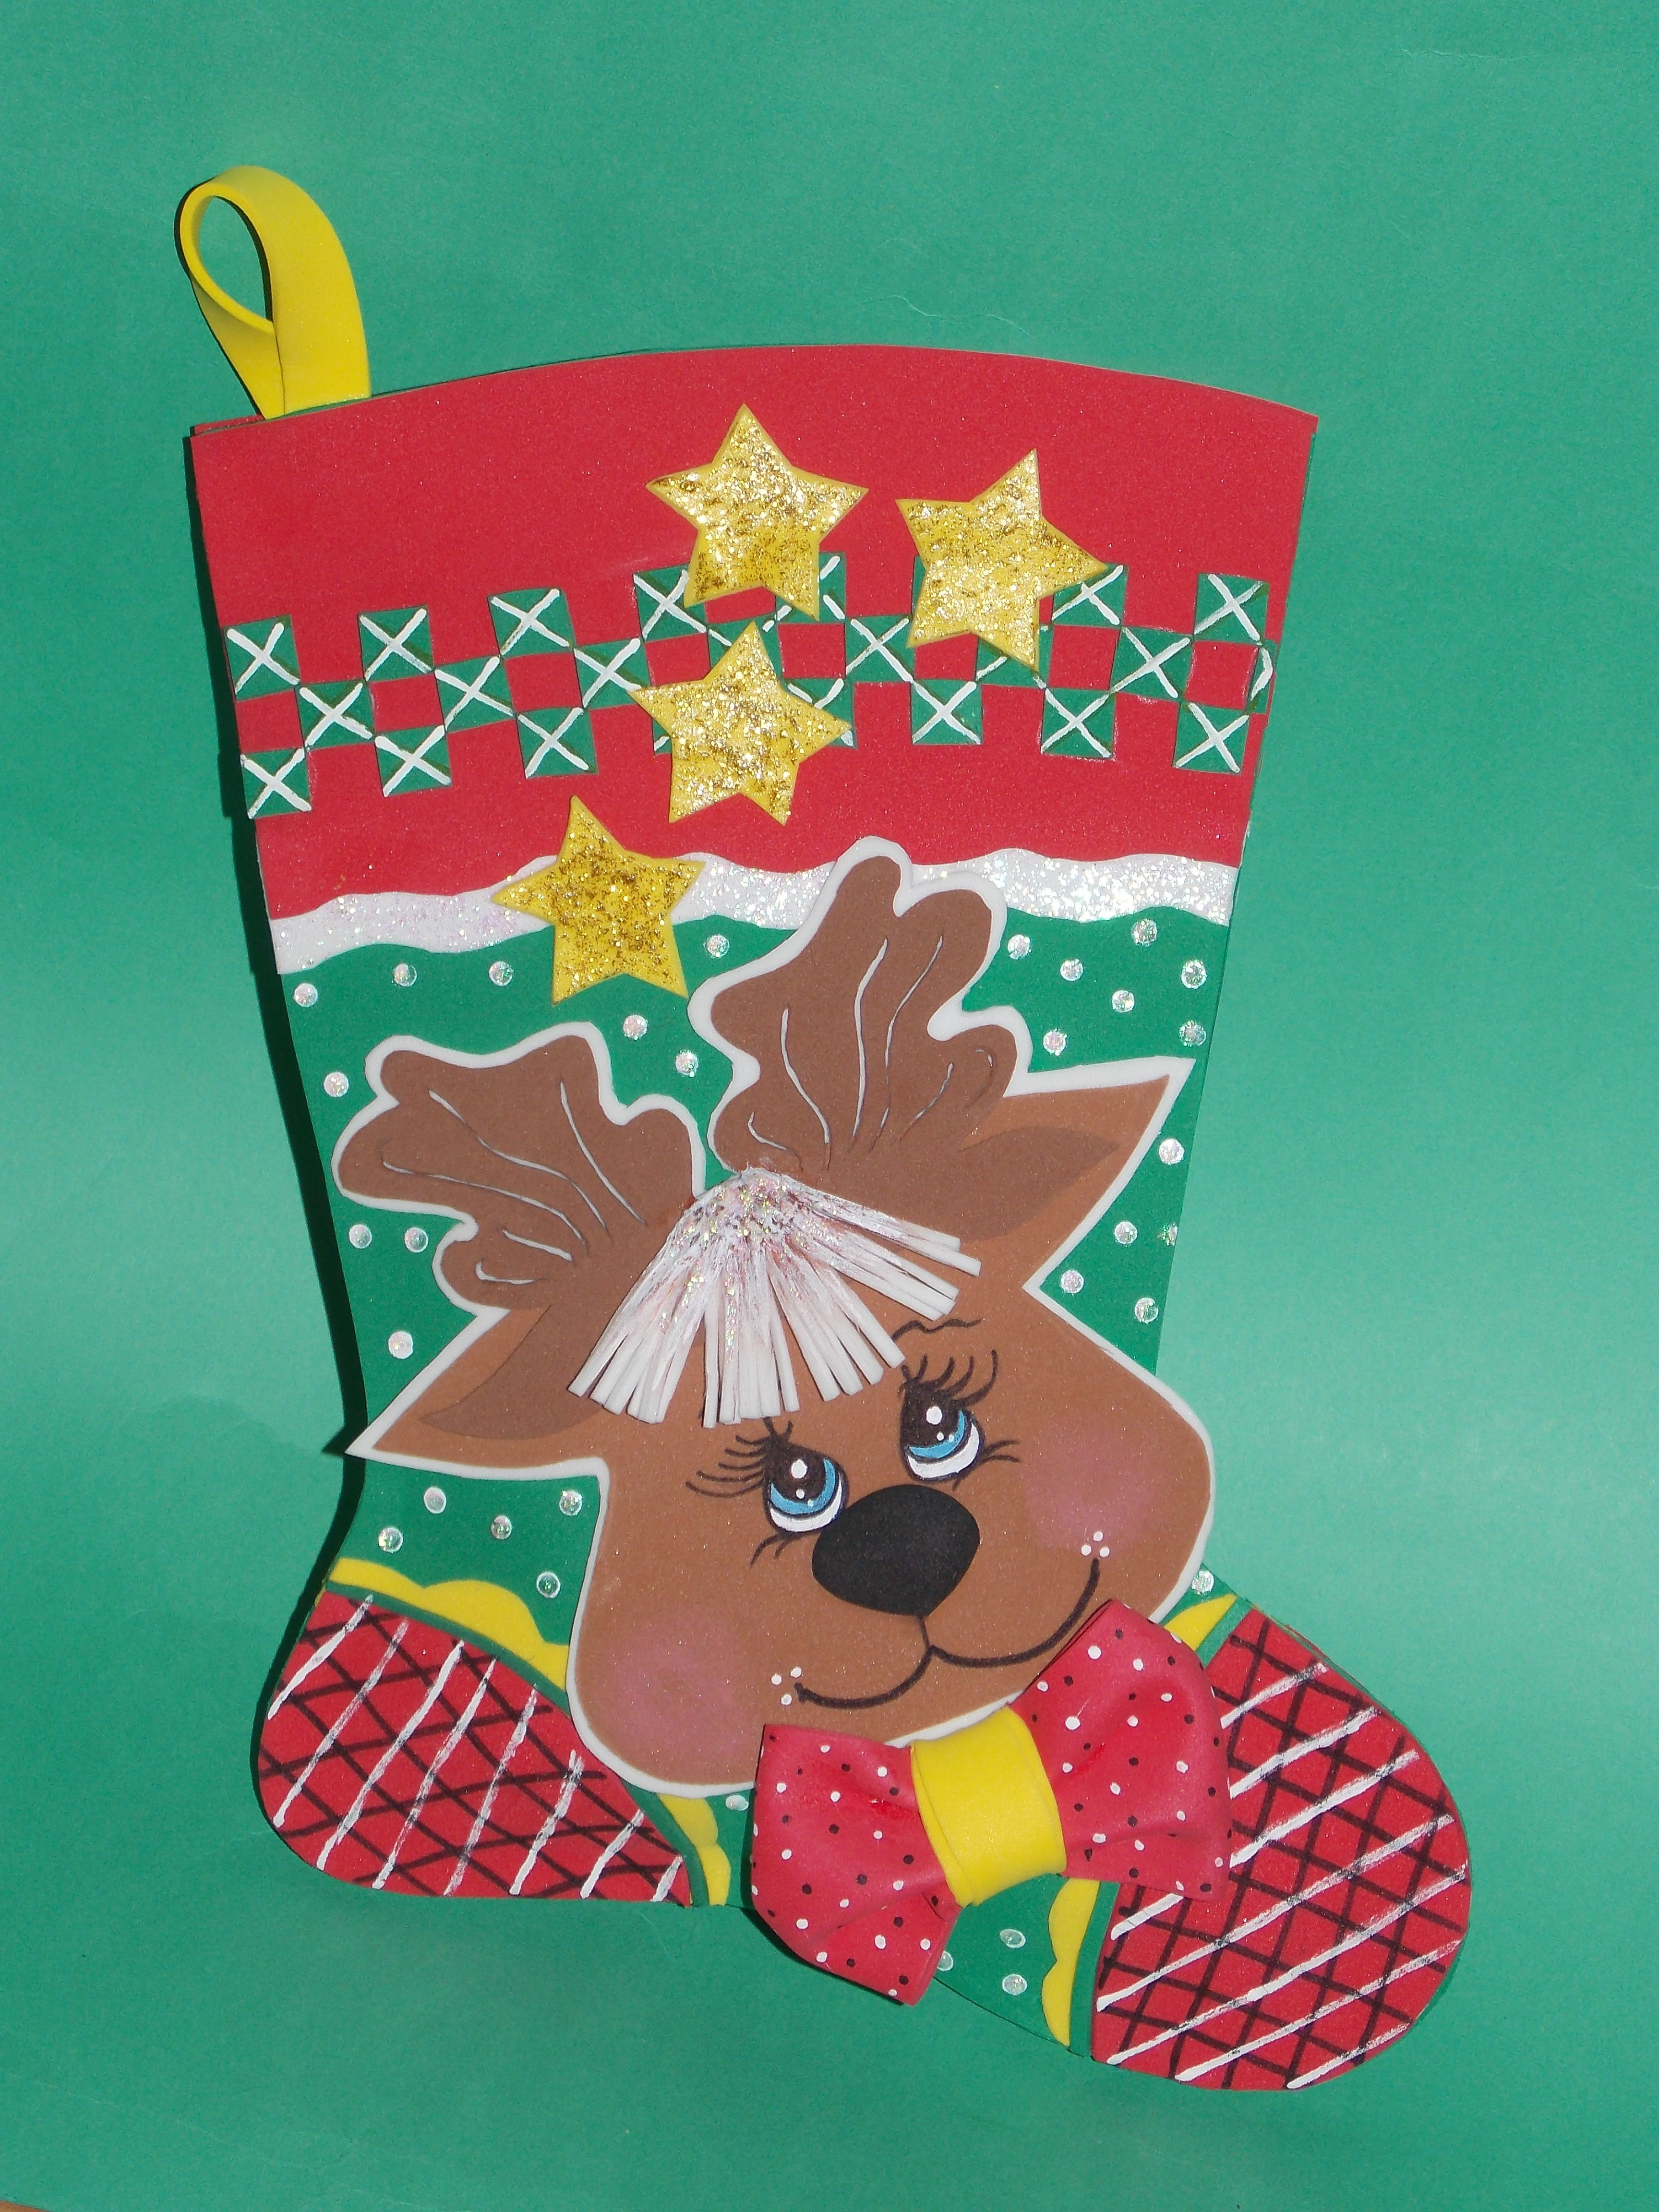 Bota navidad goma eva manualidades goma eva - Manualidades navidad goma eva ...